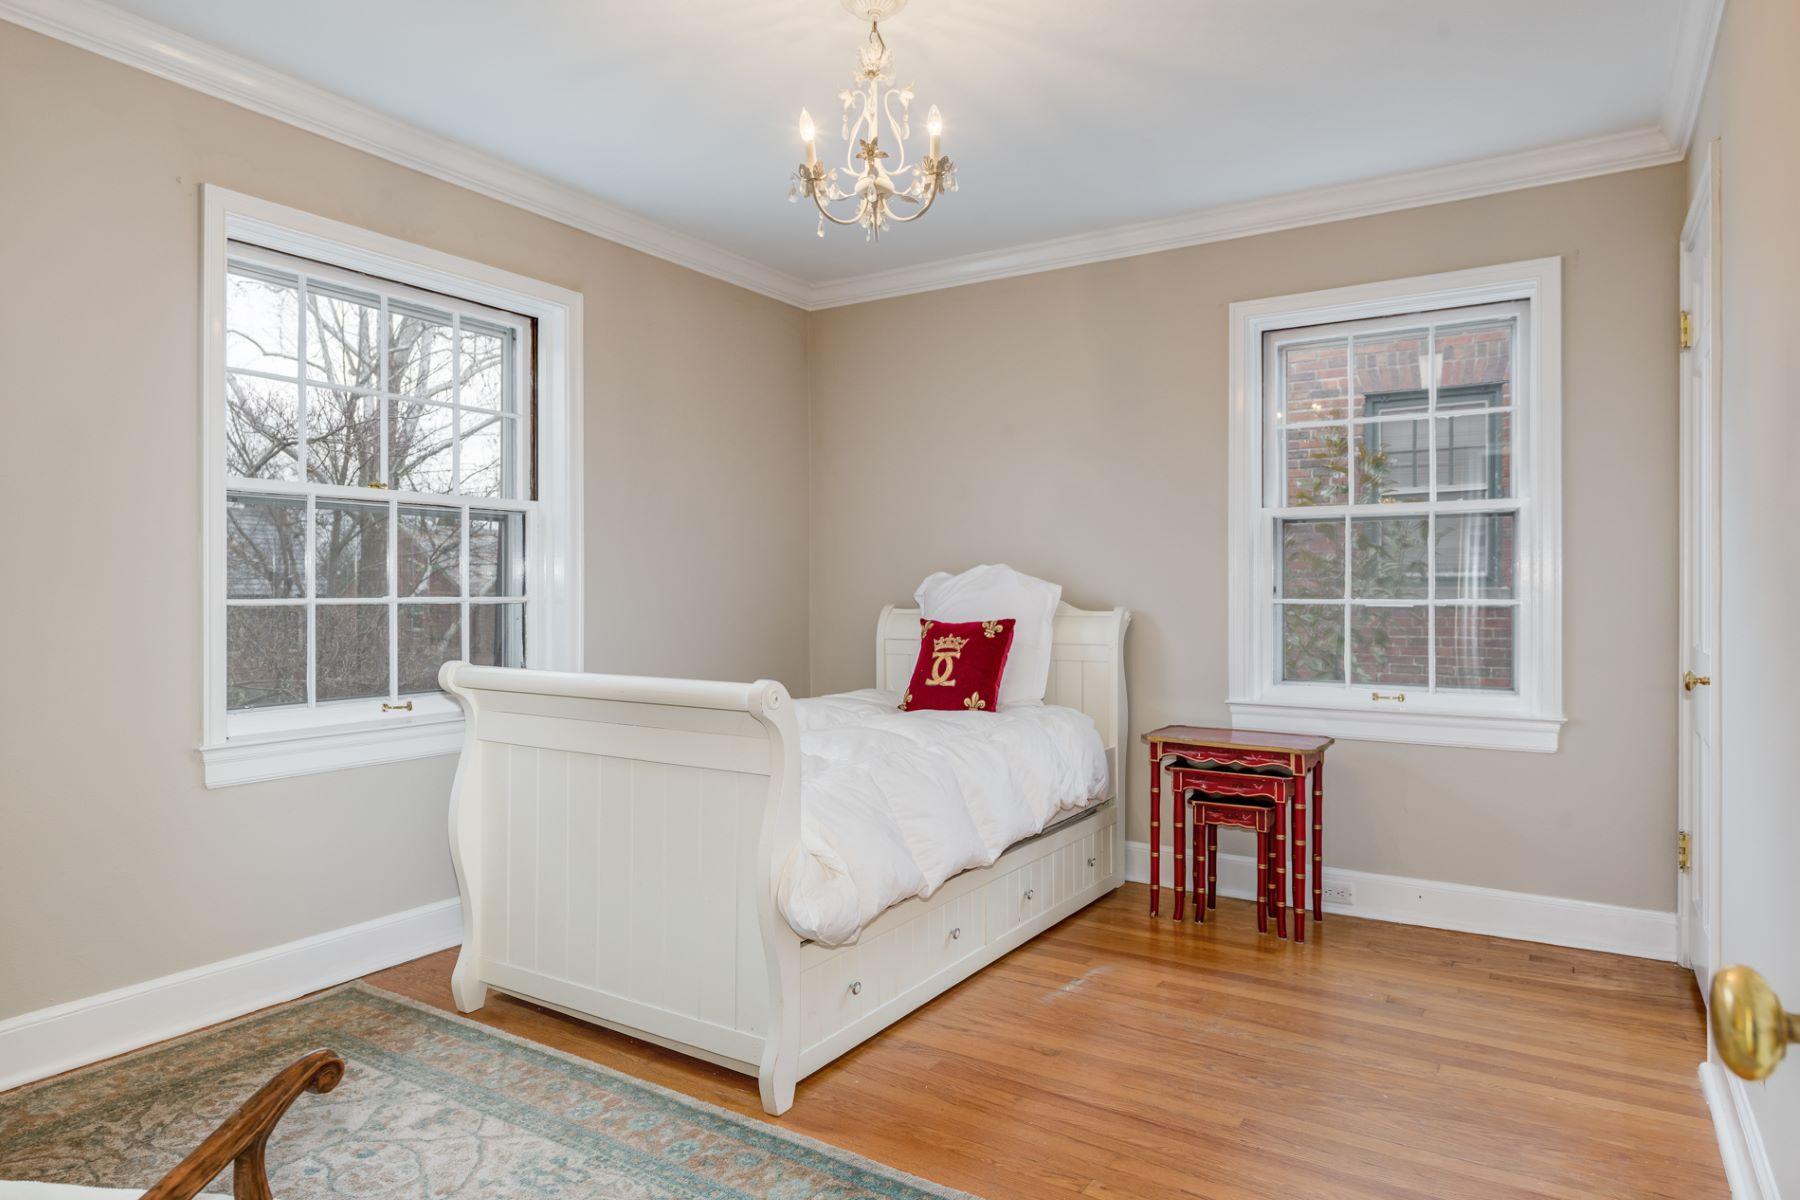 Additional photo for property listing at Princeton Ave 7170 Princeton Ave University City, Missouri 63130 United States